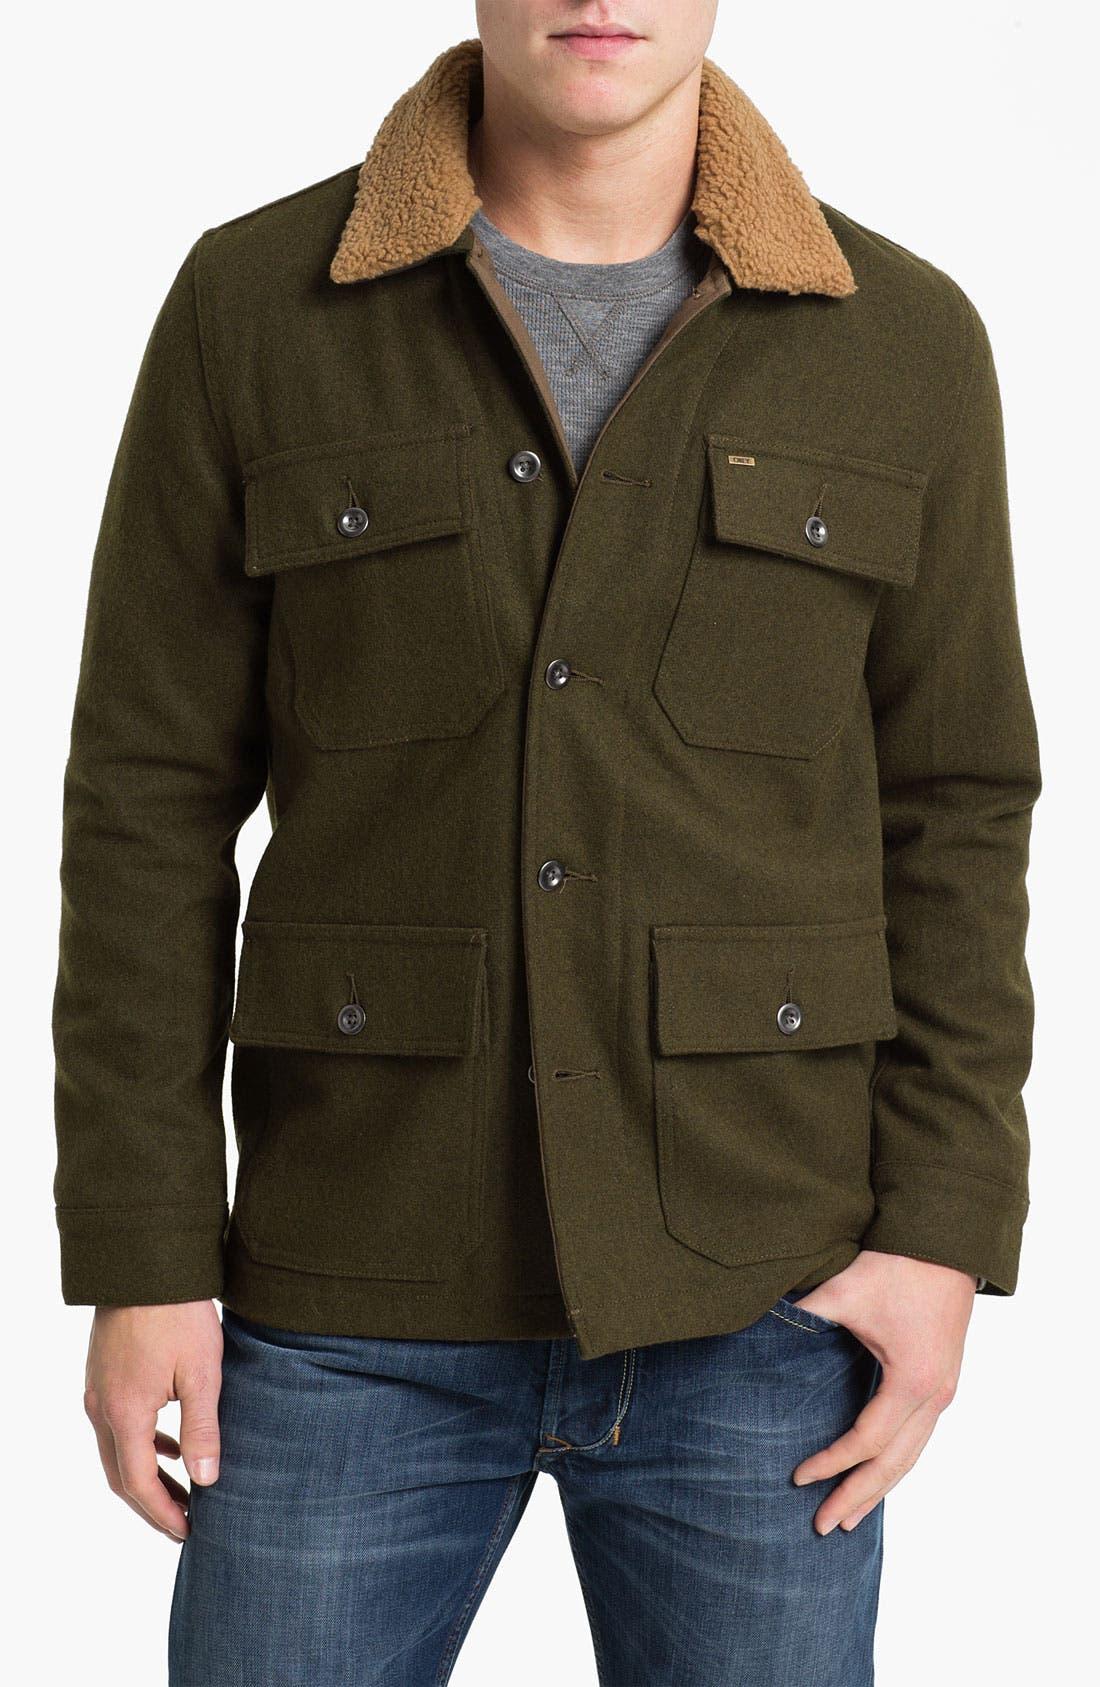 Alternate Image 1 Selected - Obey 'Winston' Wool Workwear Jacket